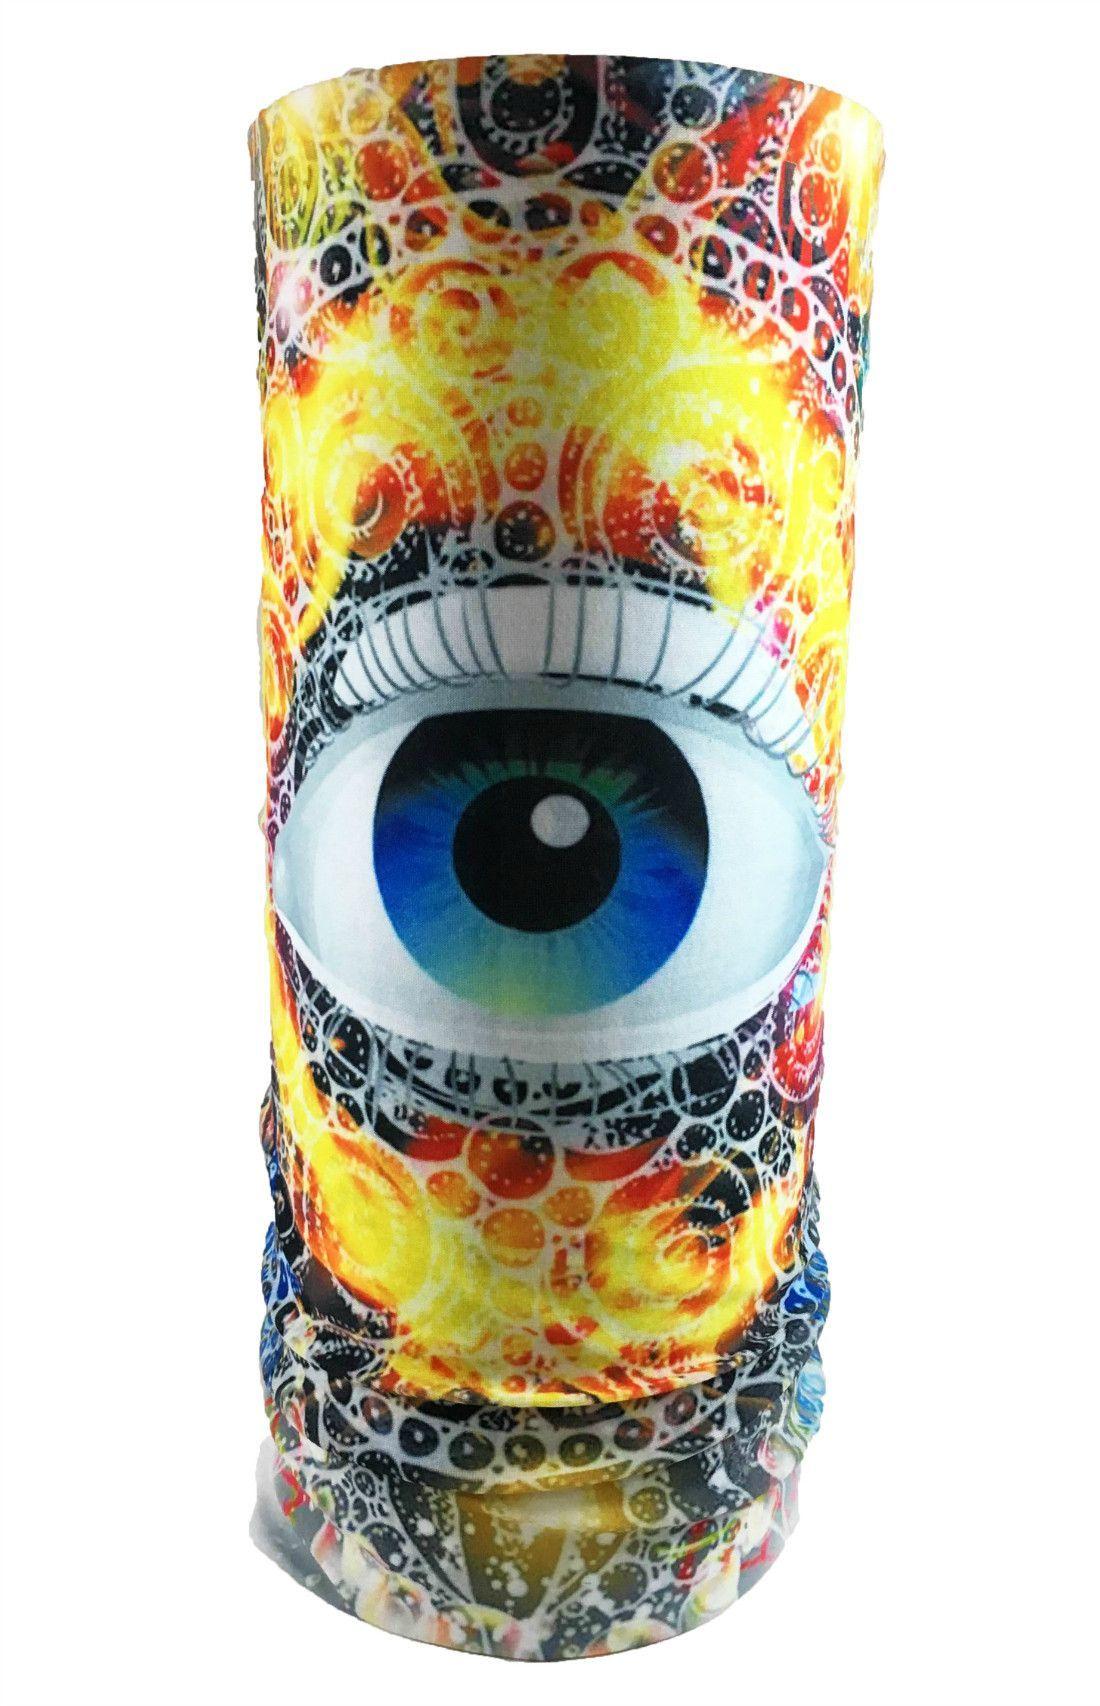 Flaming Eye Rave Bandana Multifunctional Seamless Mask